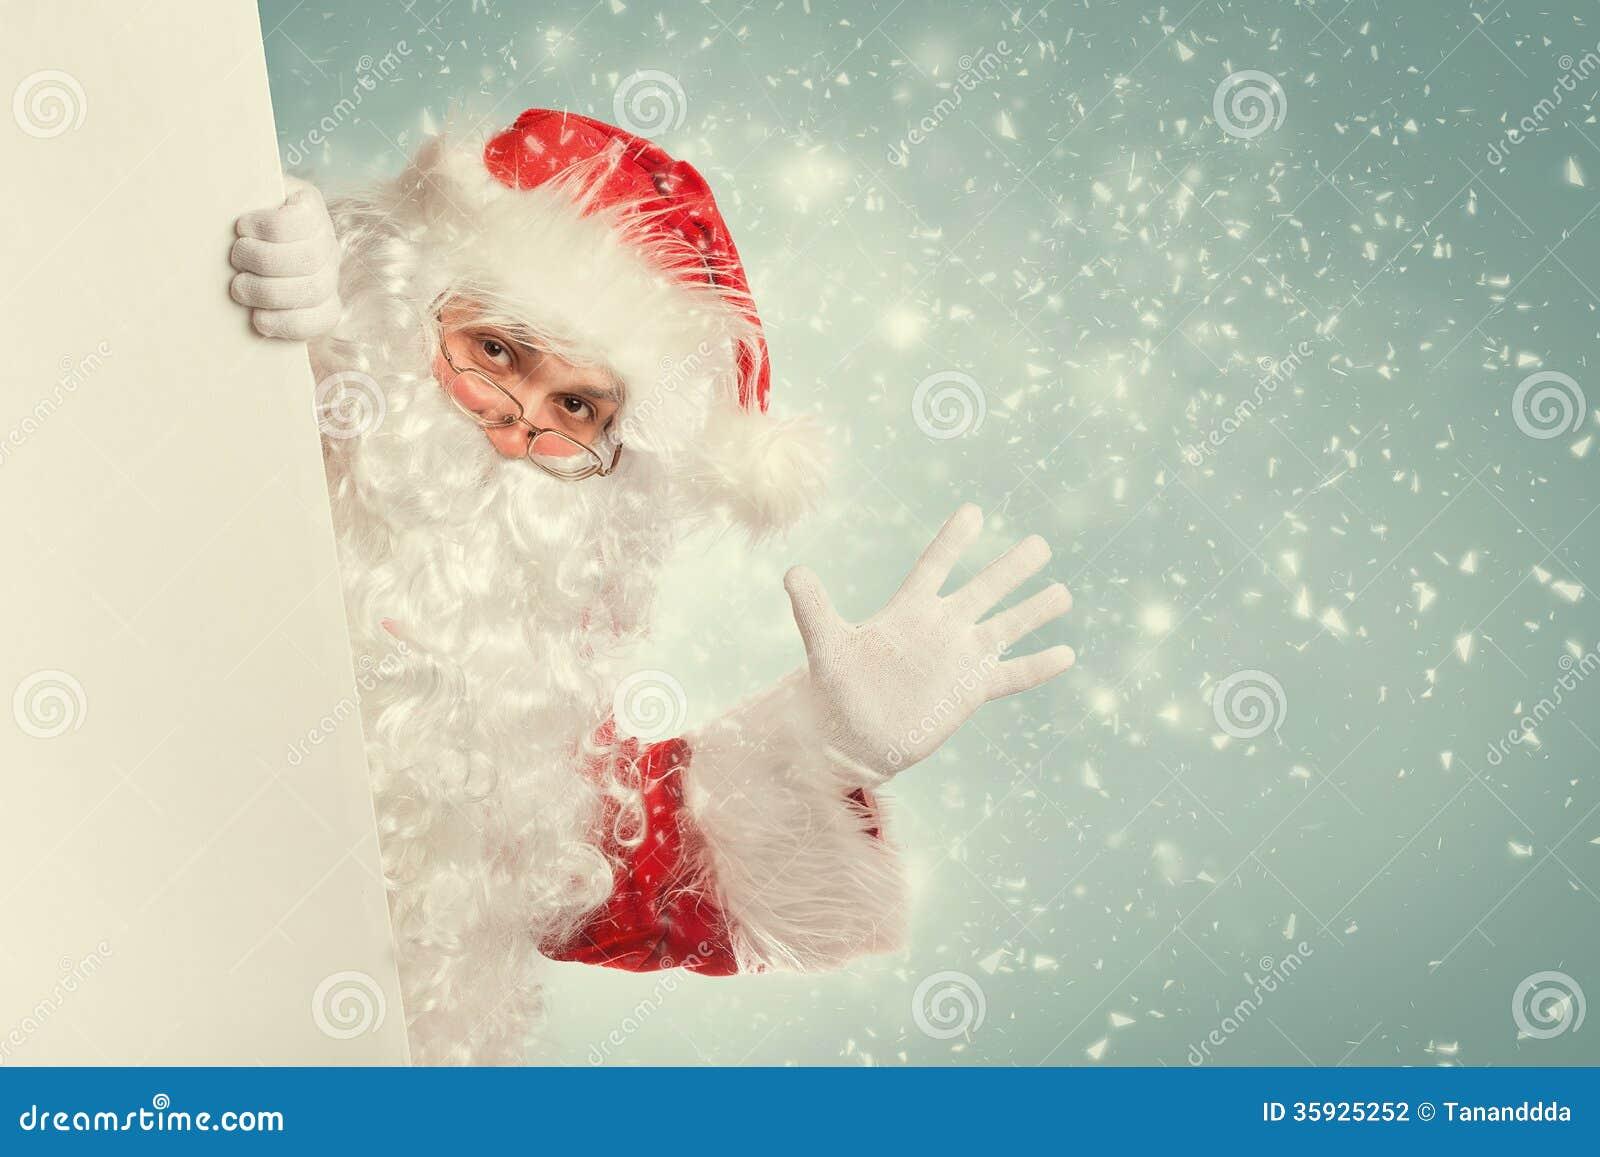 Christmas Copy Paper